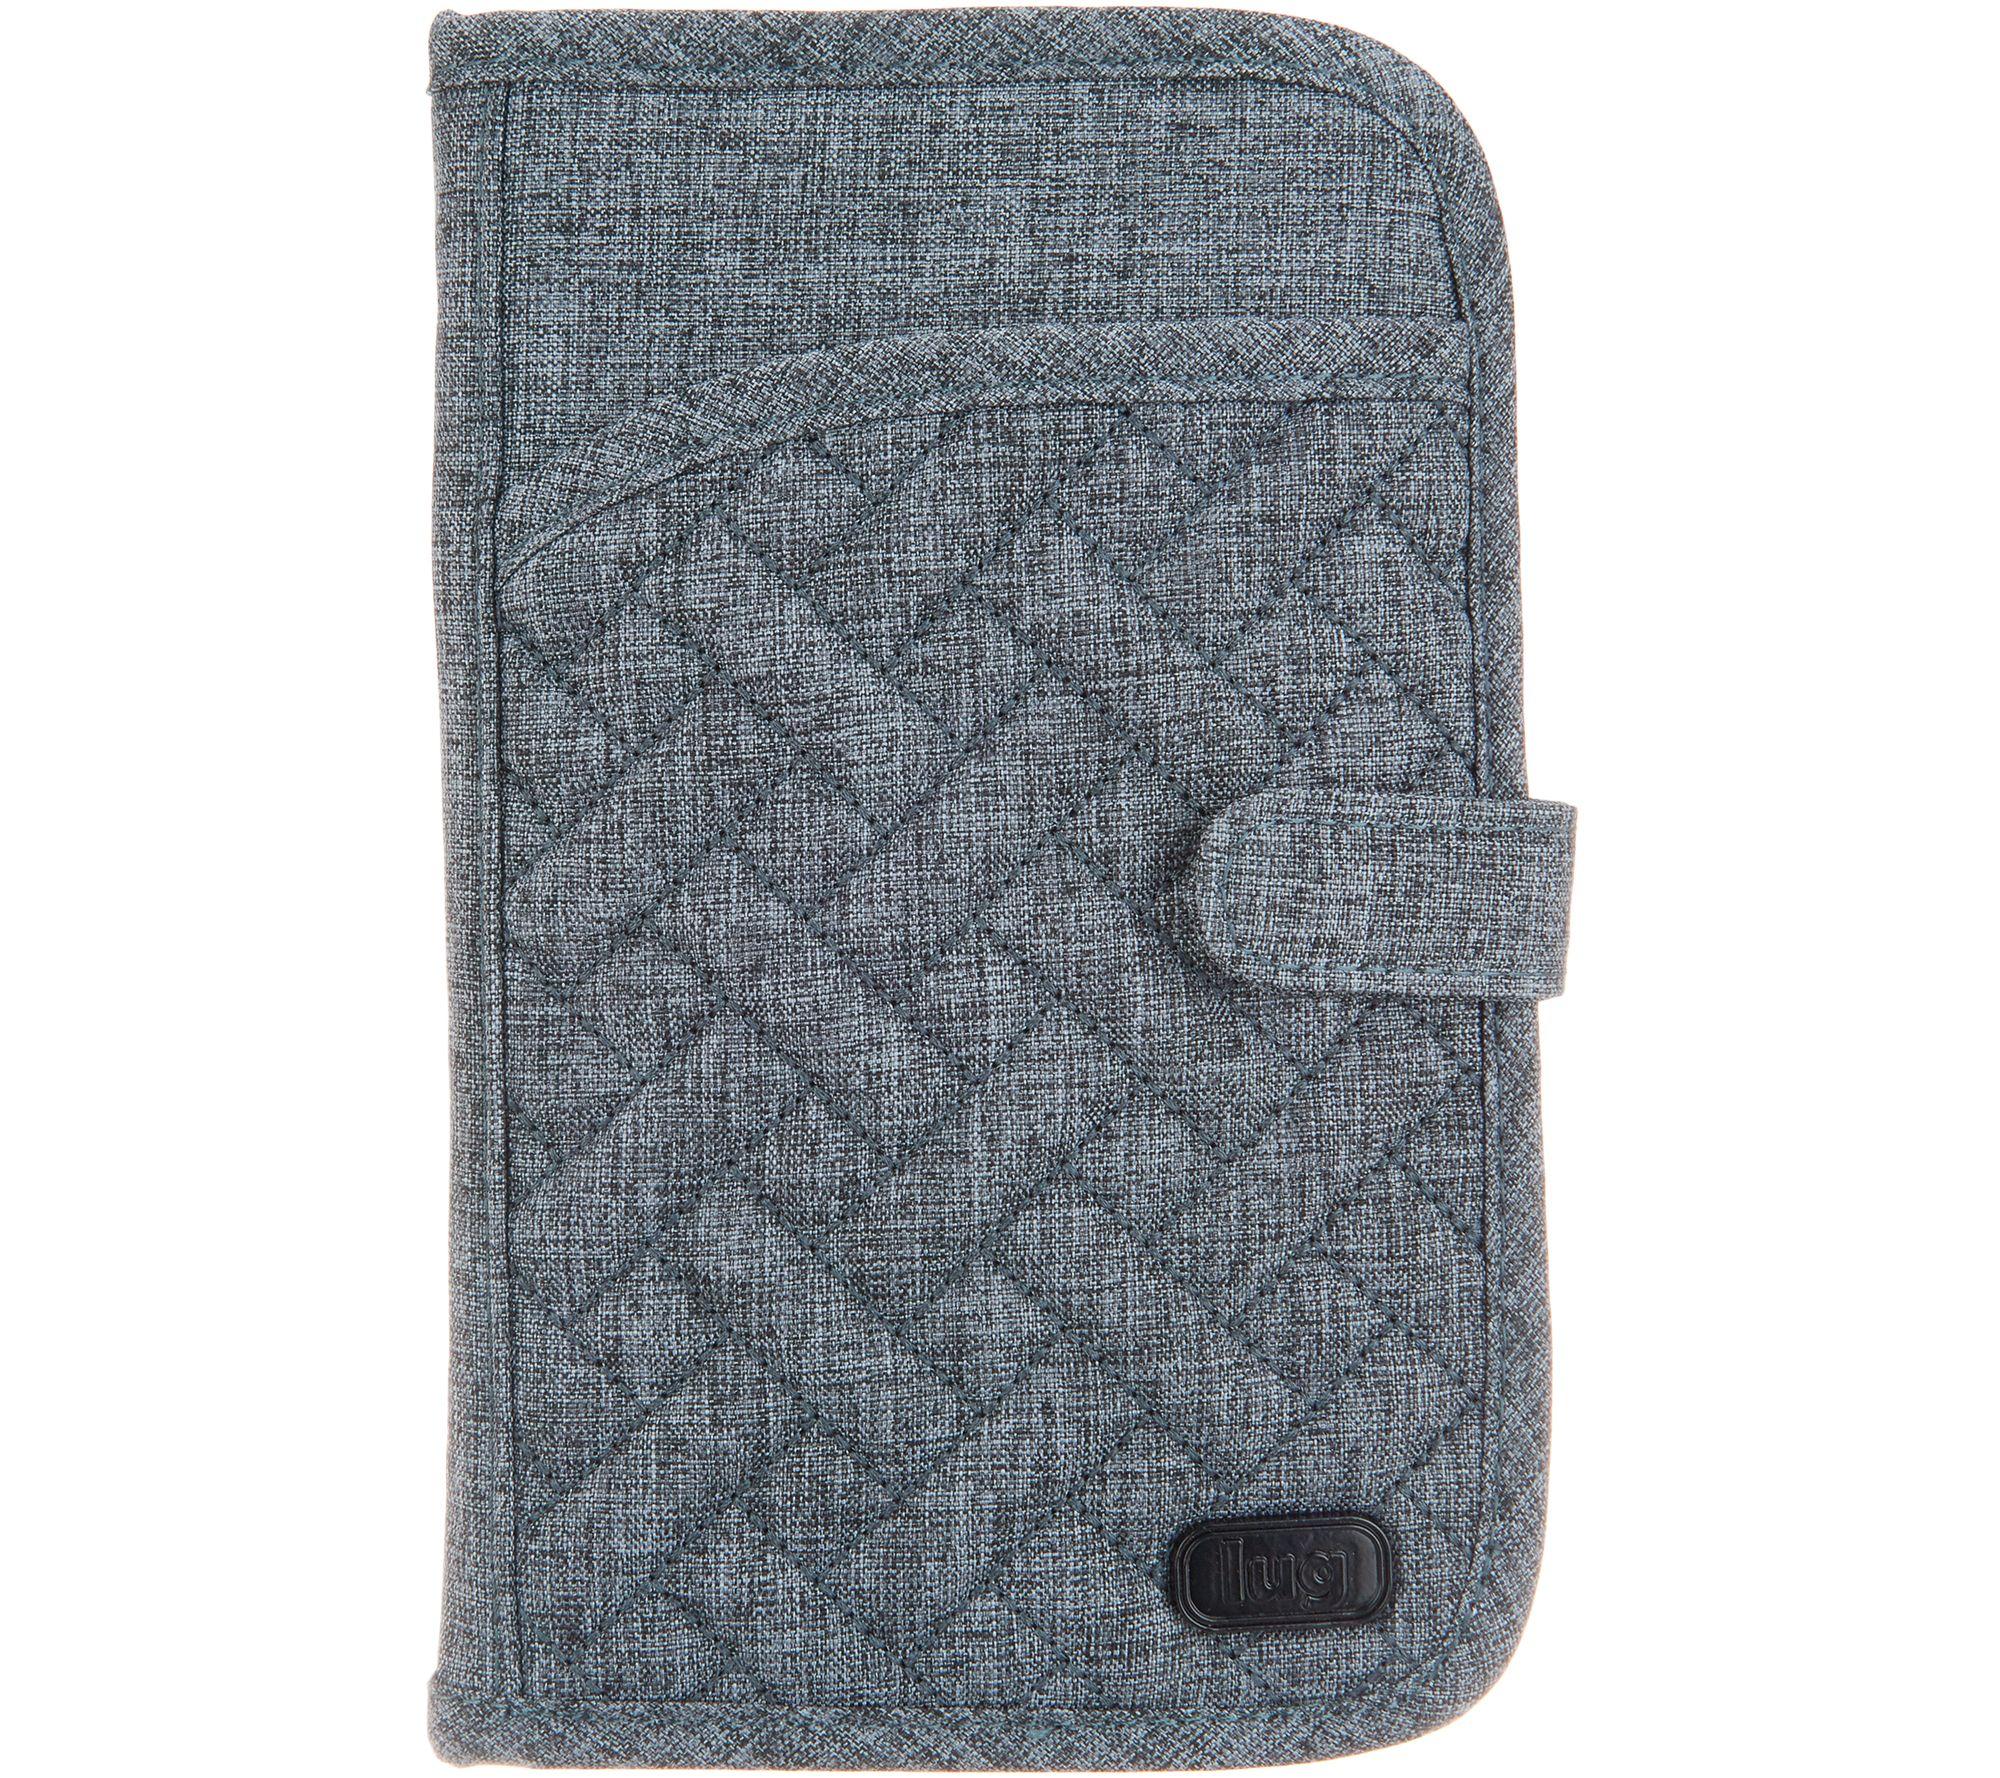 3007c3d0bac2 Lug North/South RFID Wallet - Tandem Snap — QVC.com